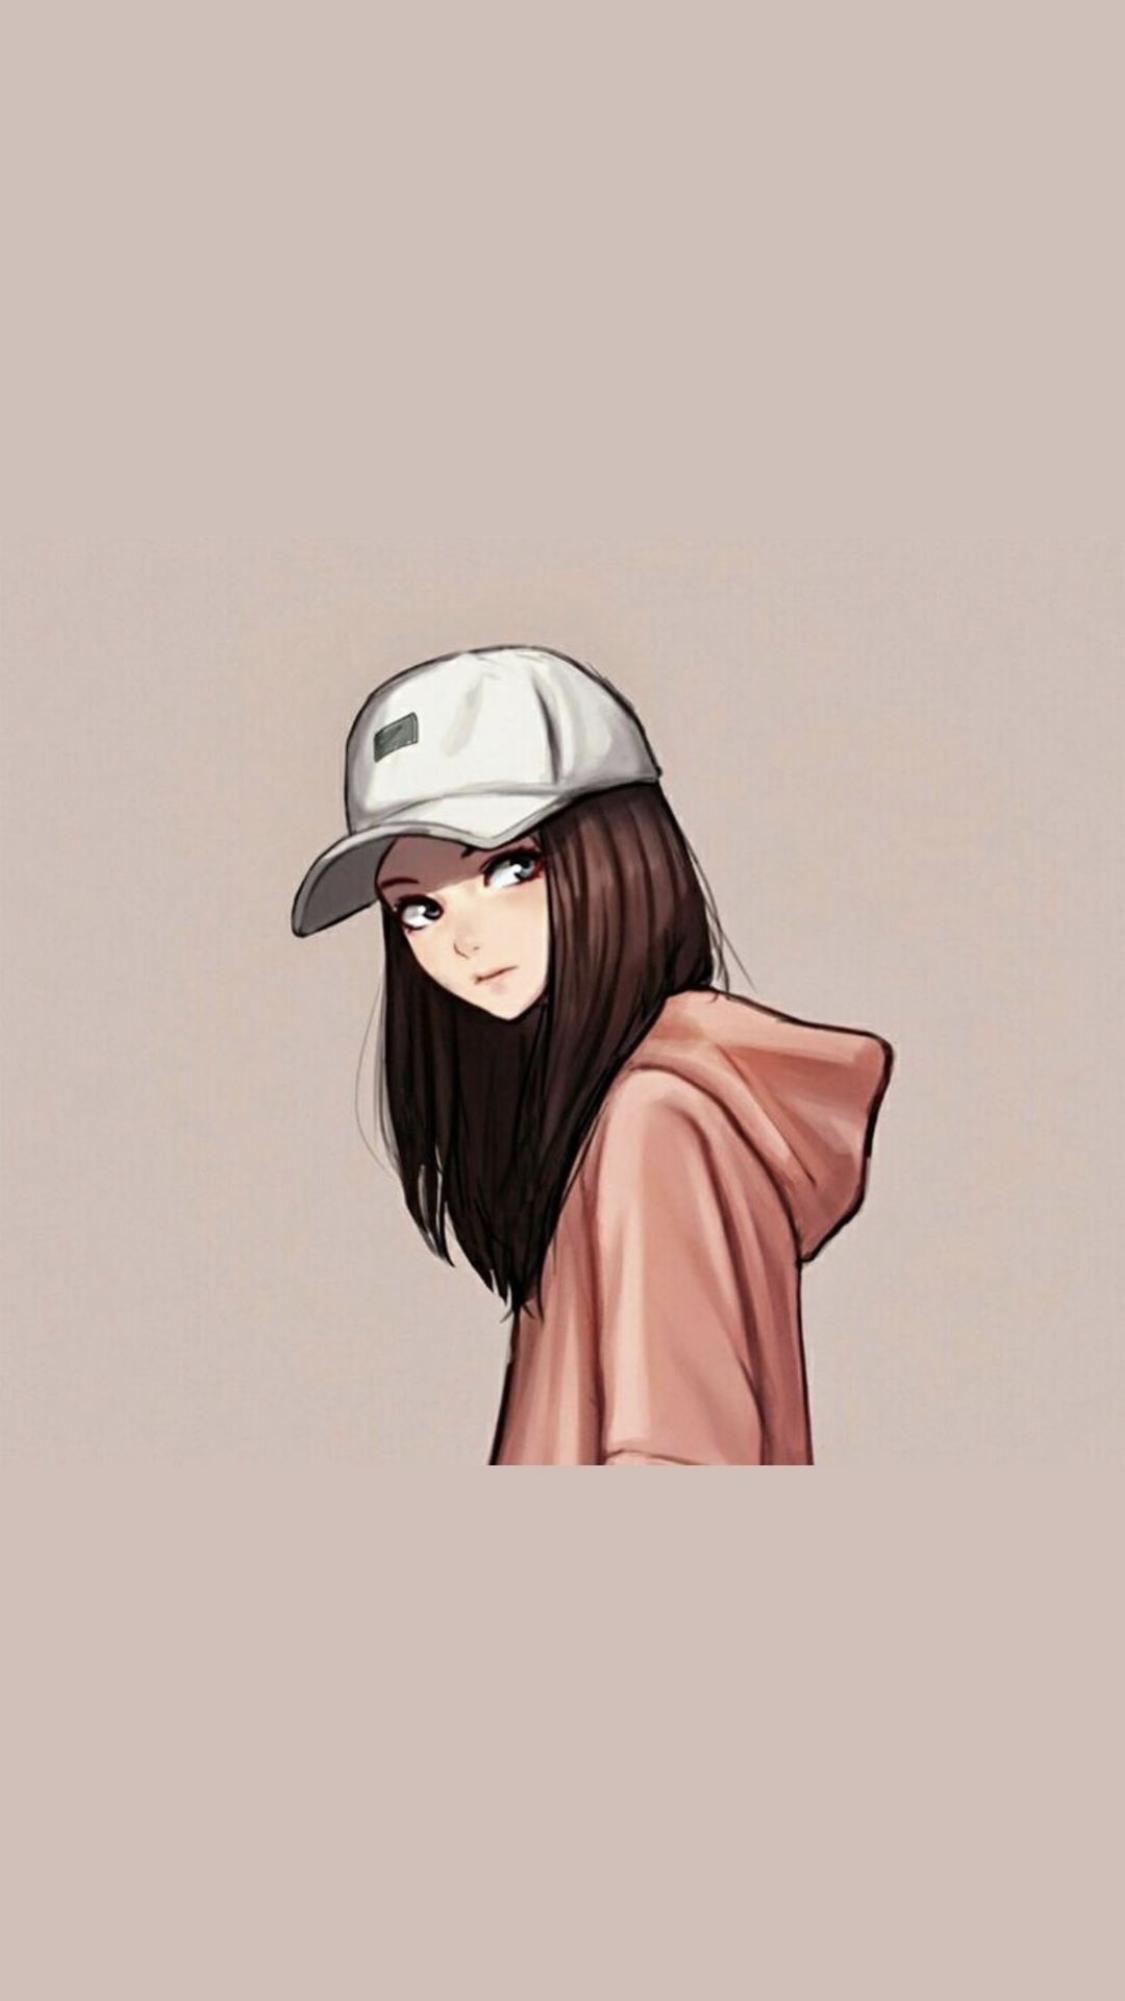 Pin By Wajeeha Siddique On Mixed Girls Cartoon Art Cartoon Art Styles Anime Art Girl